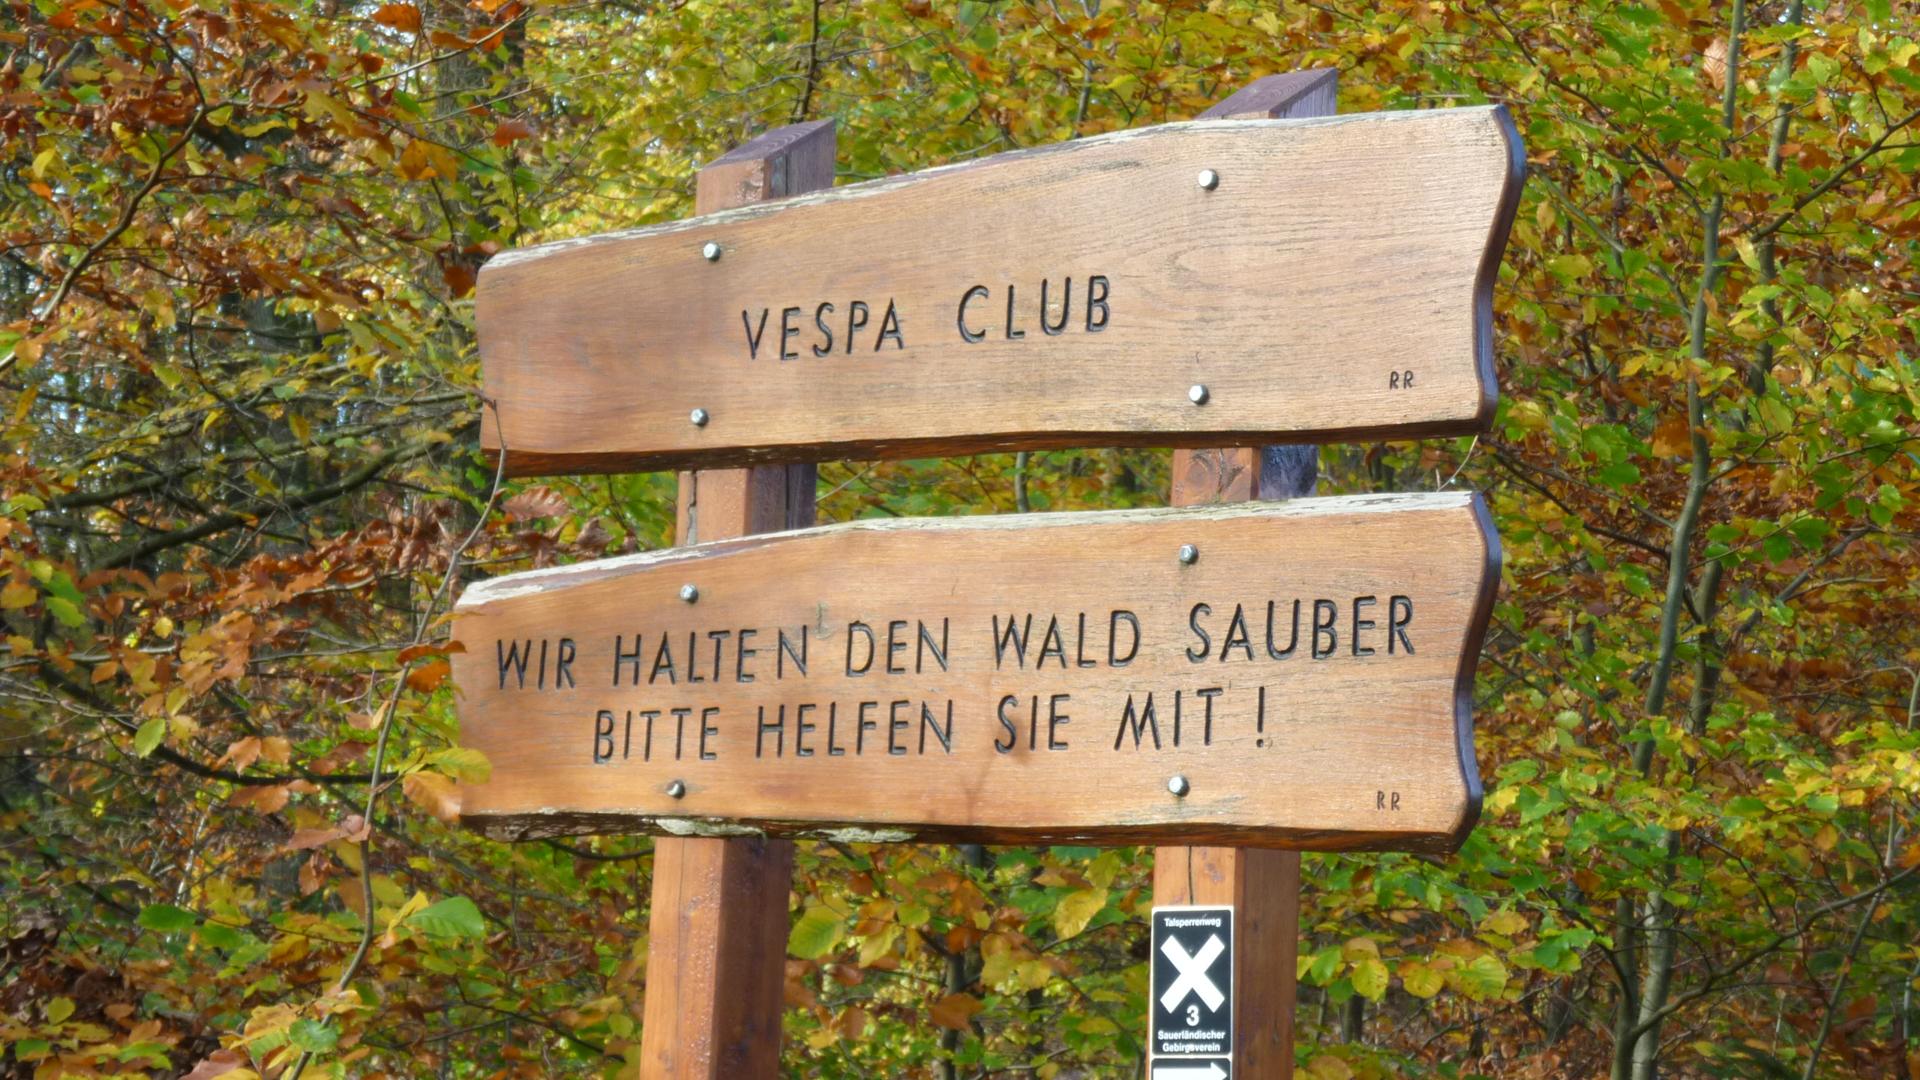 Vespa Life Vespa Club Hagen Wegweiser